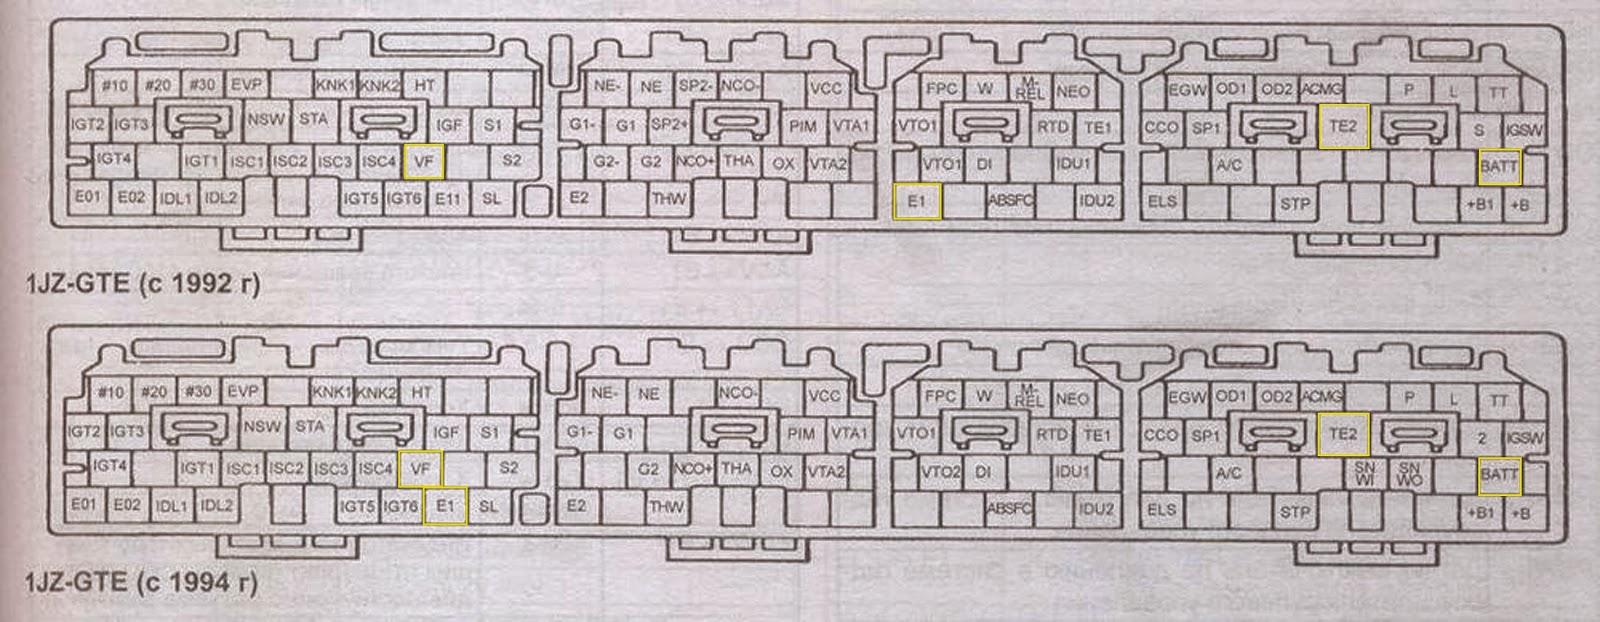 WRG-7916] 2jz Gte Vvt I Ecu Pinout Wiring Diagram